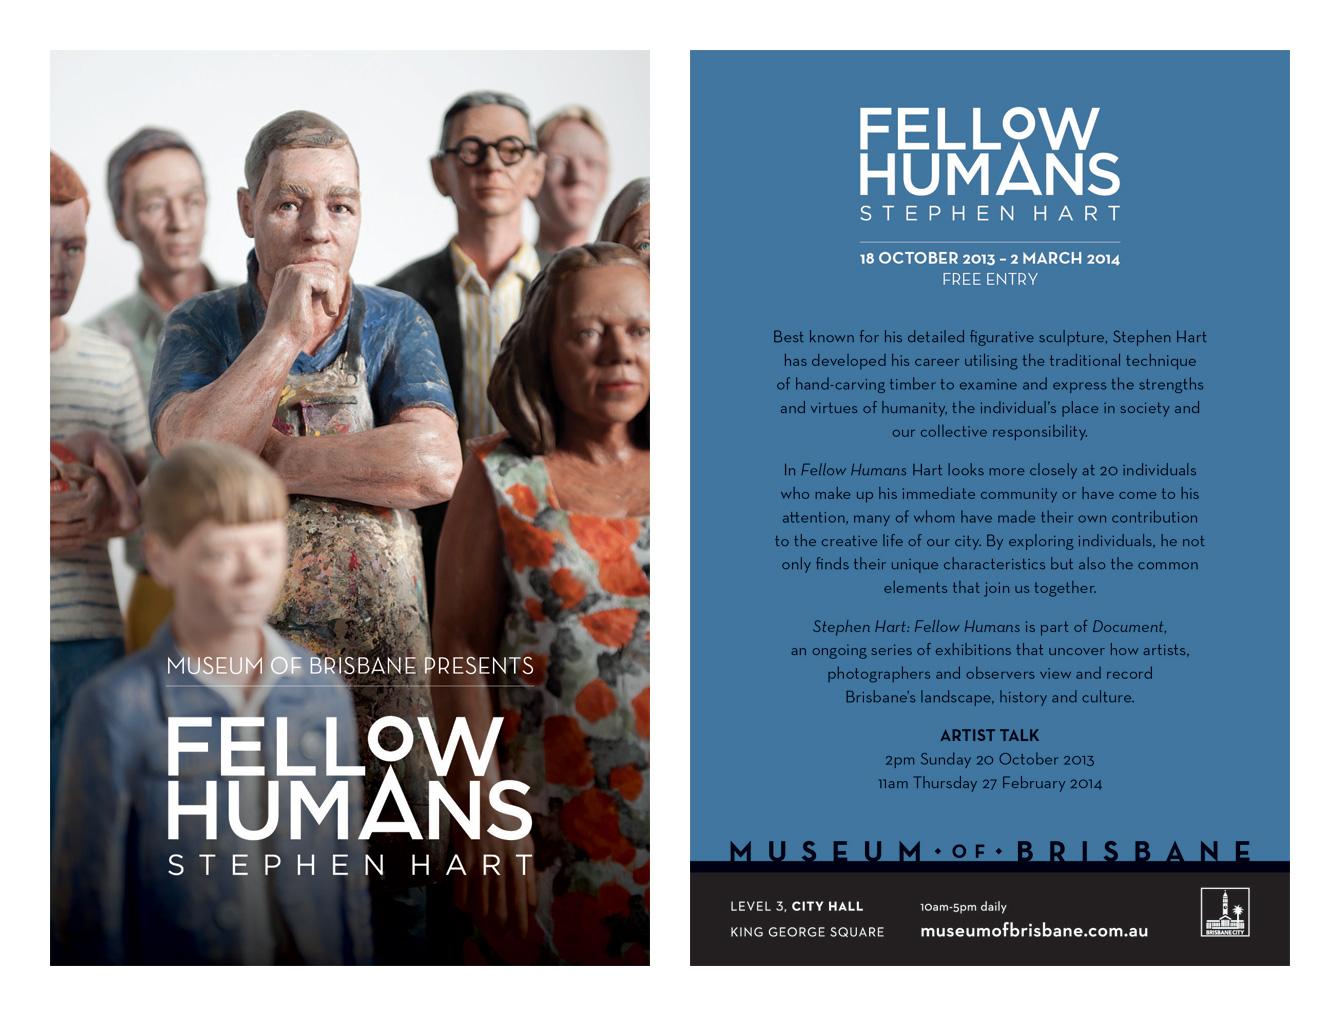 MoB_Fellow-Humans-Post-Card.jpg